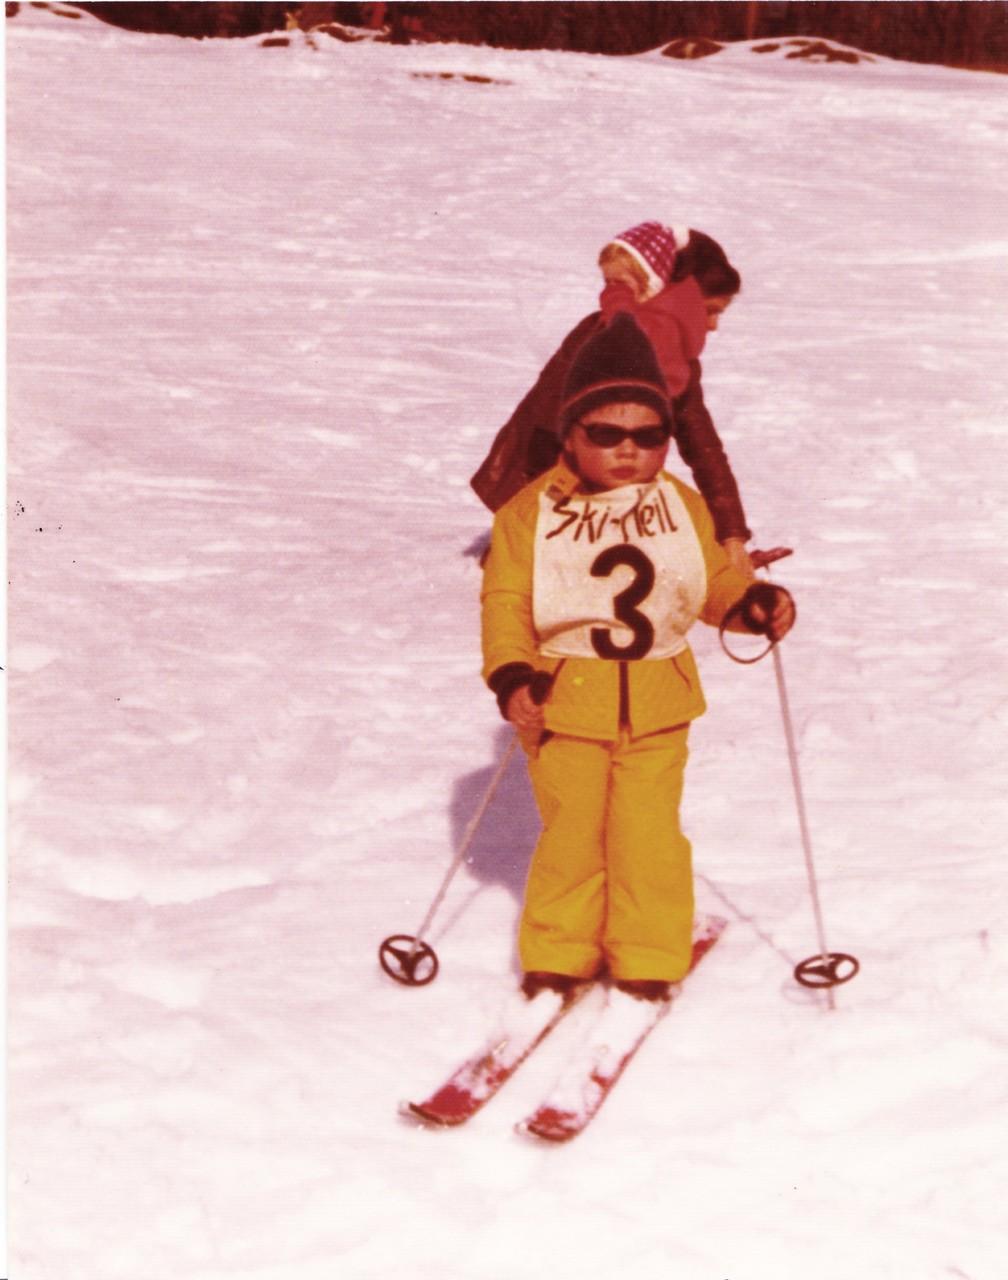 Schülerskirennen ca. 1976, Patrizia Balmer